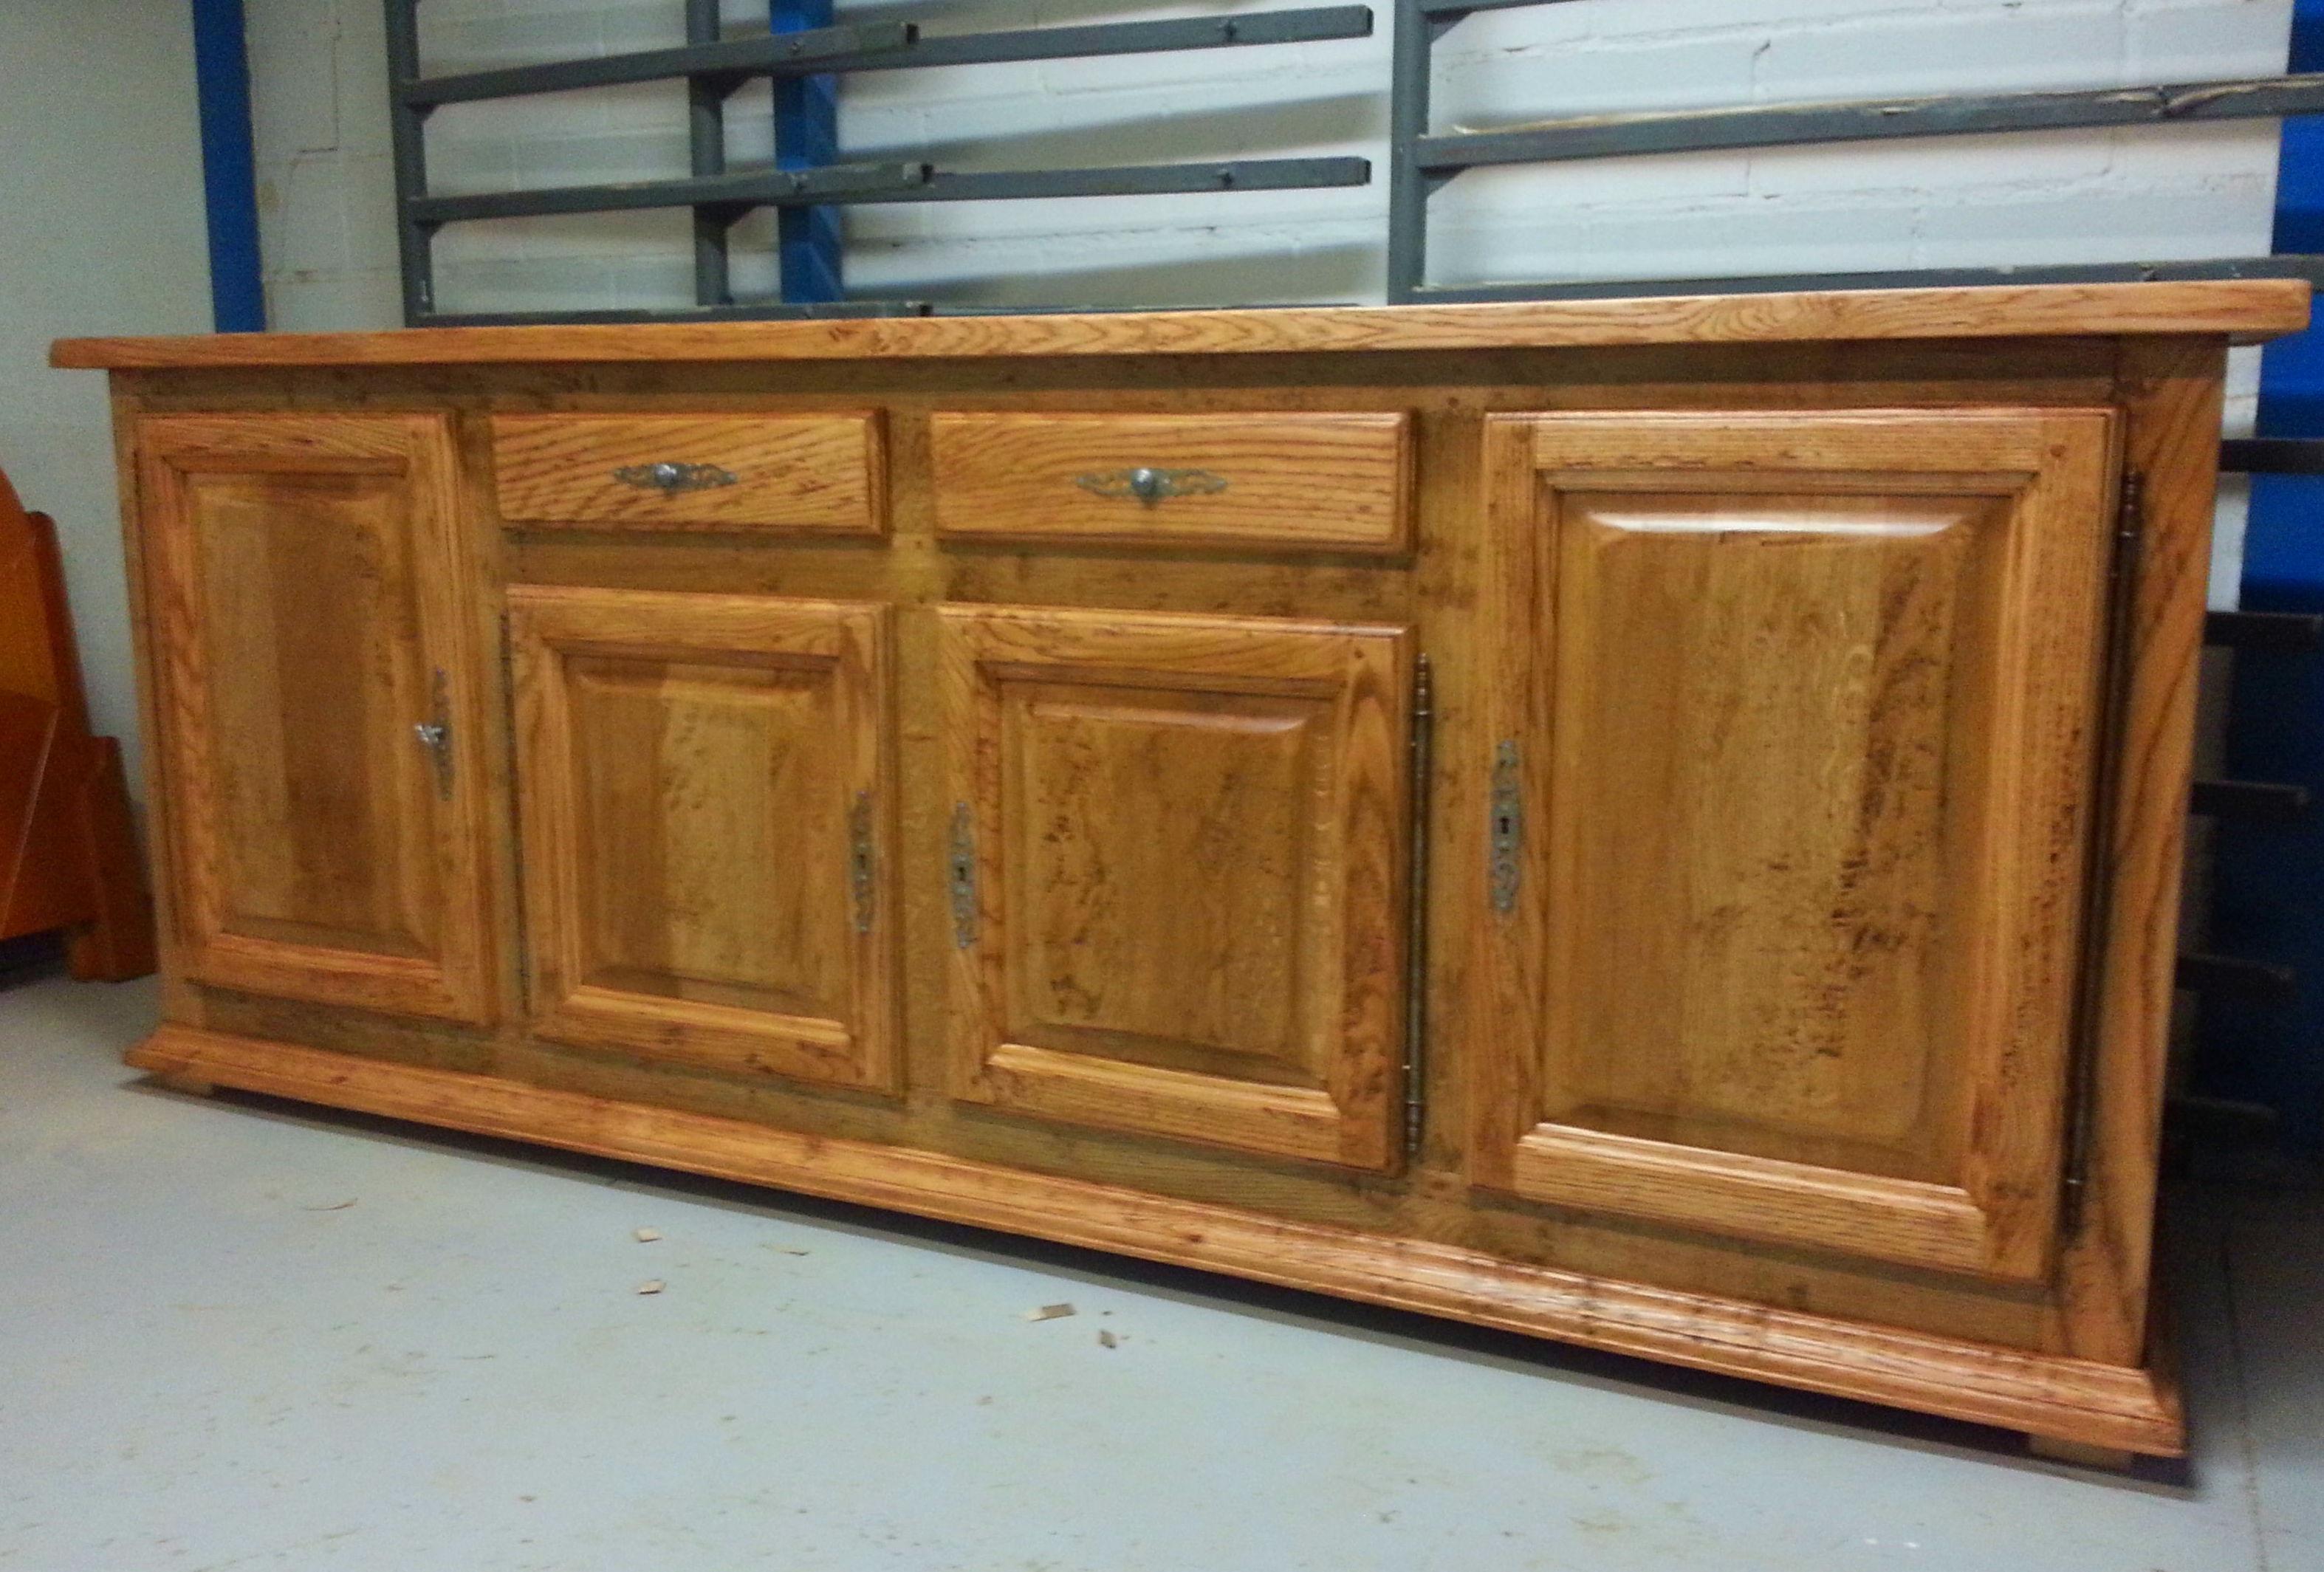 Muebles de roble macizo usados 20170731120210 - Muebles de roble macizo ...